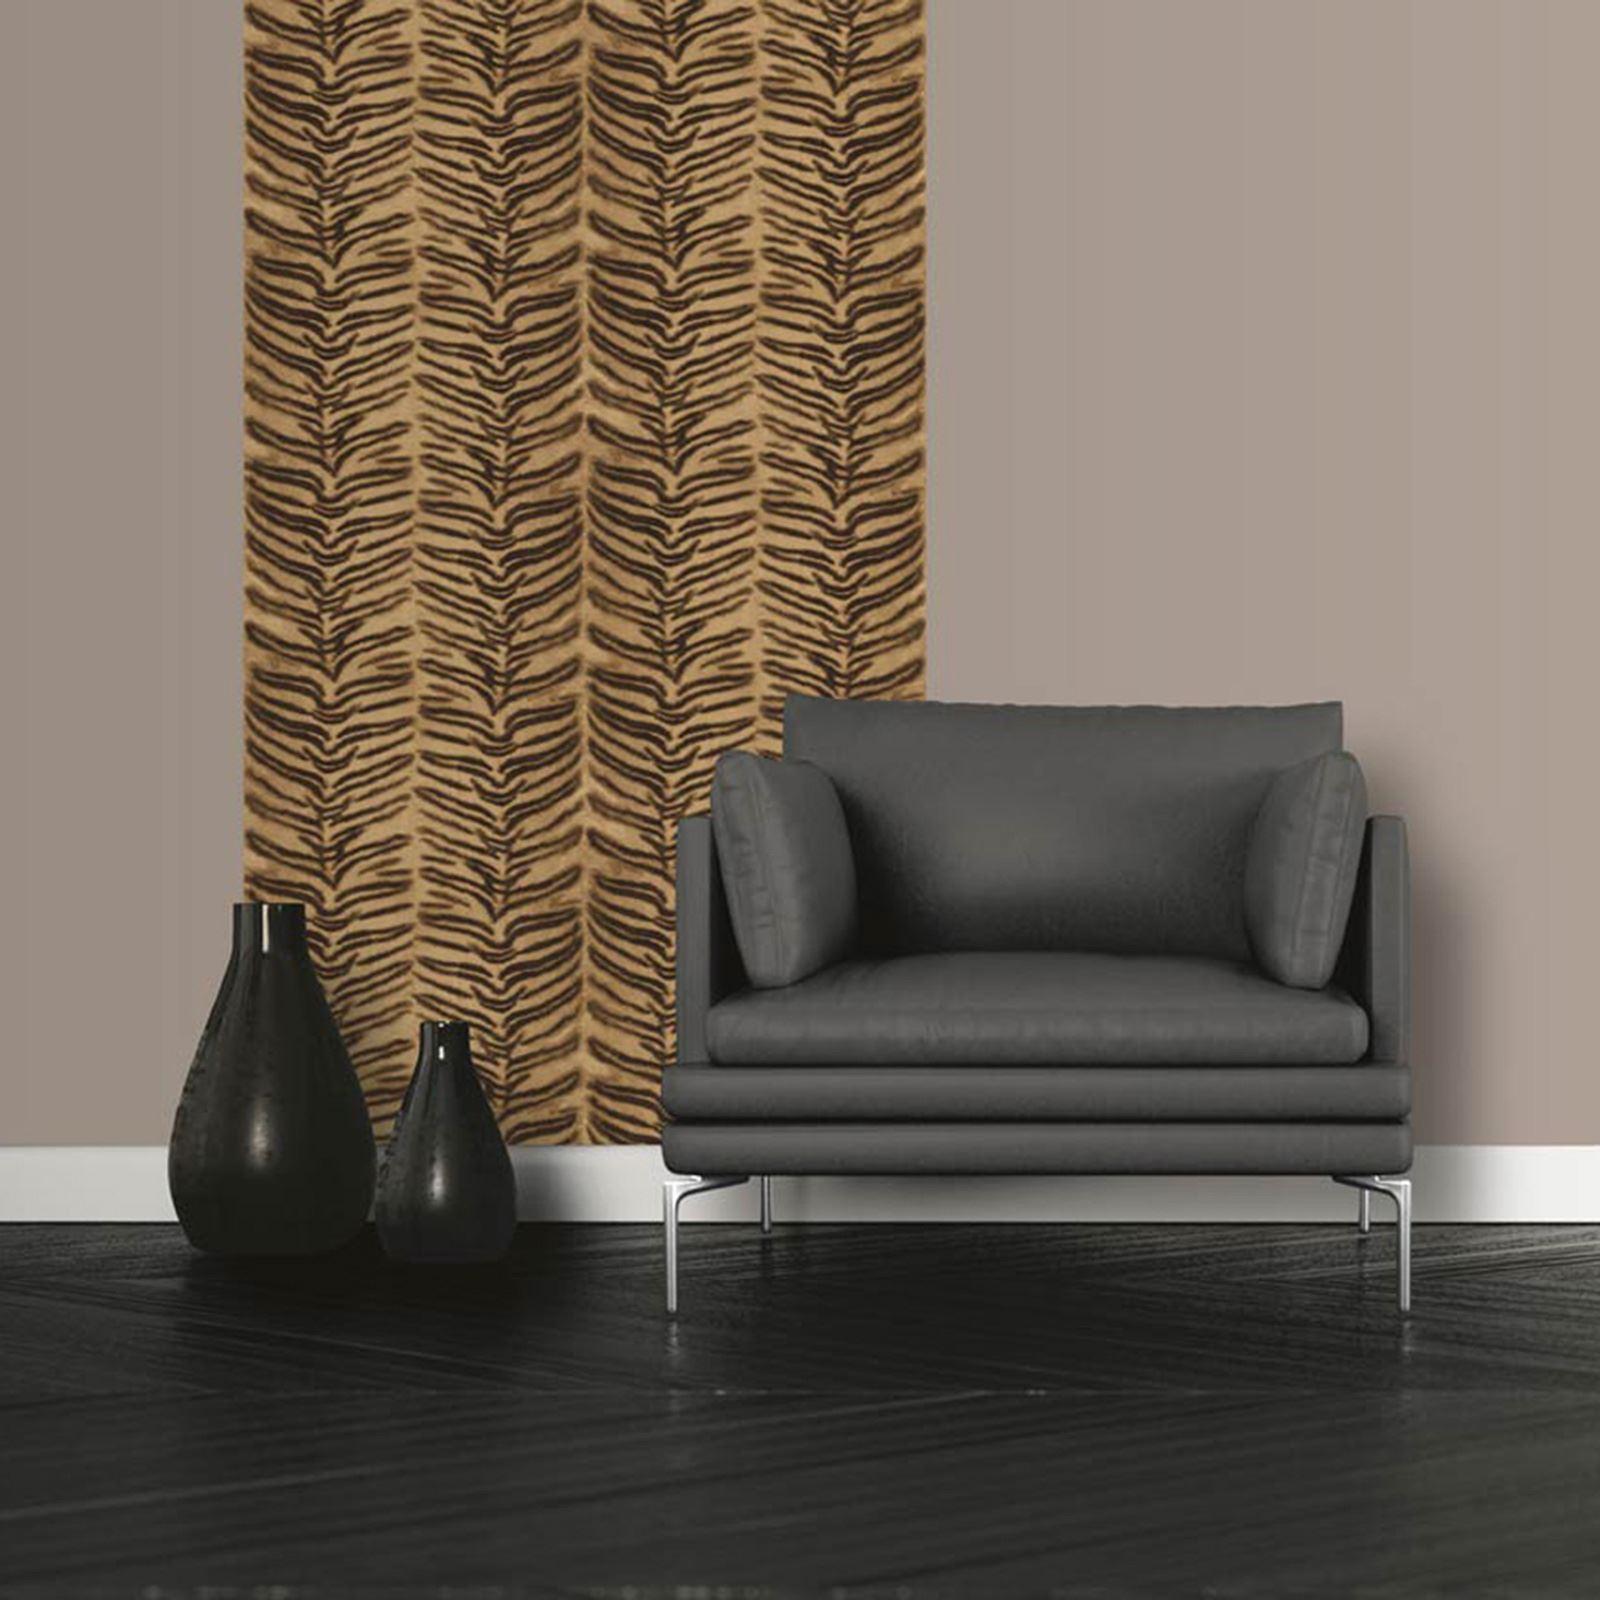 muriva tigre impression animal papier peint texture r aliste blanc naturel dor ebay. Black Bedroom Furniture Sets. Home Design Ideas